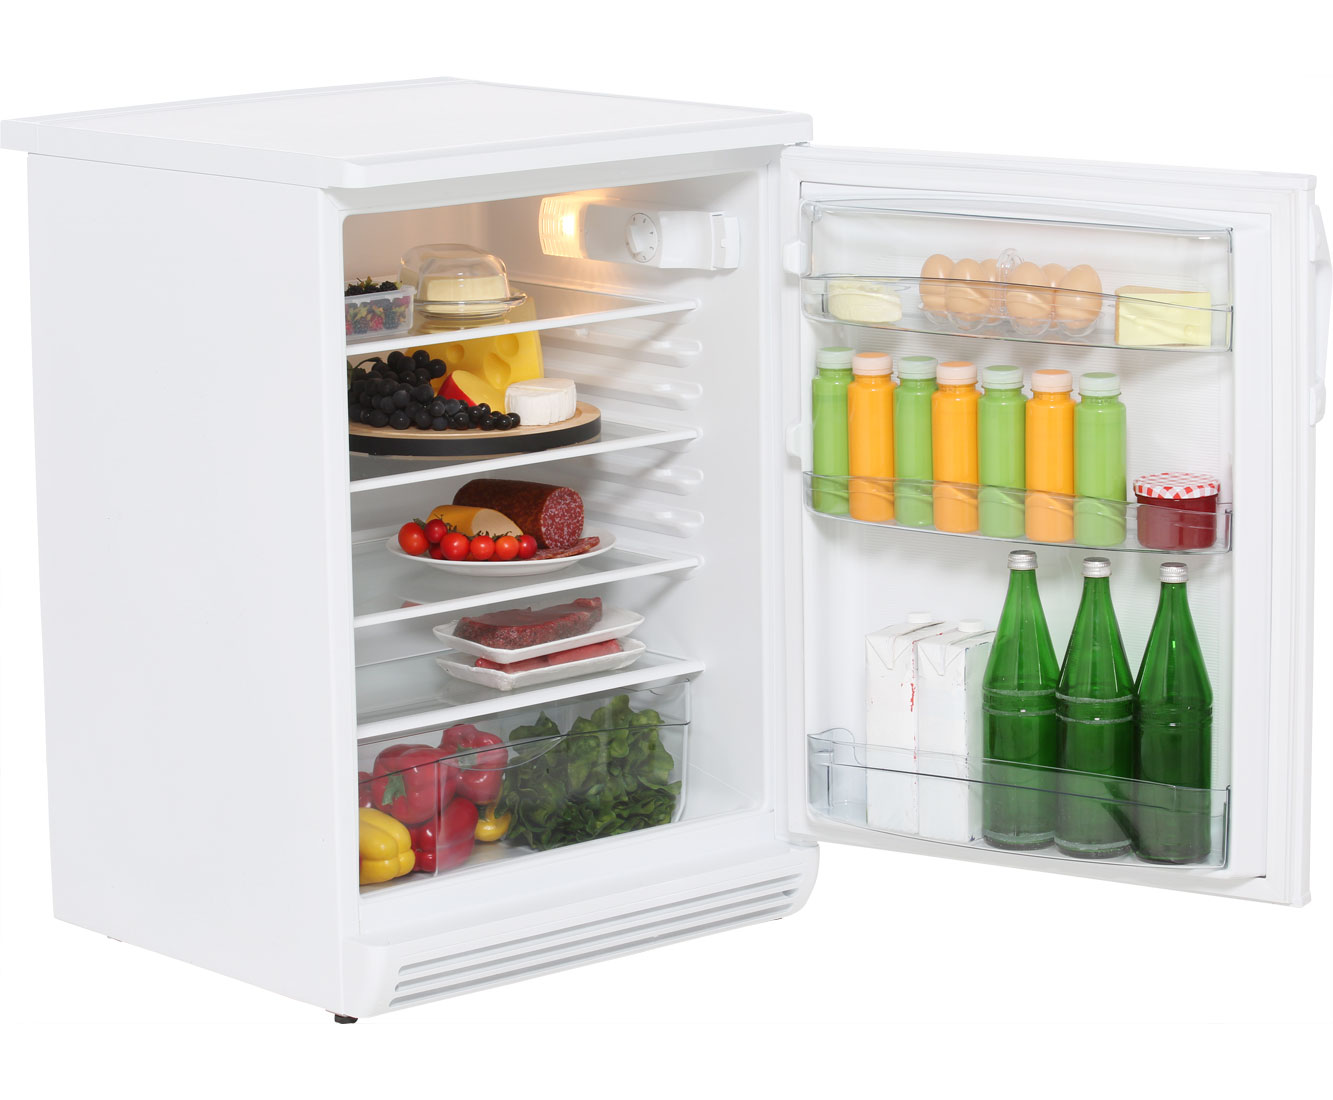 Smeg Kühlschrank Rafaello : Kühlschrank 60 liter amstyle mini kühlschrank 65 liter kleiner